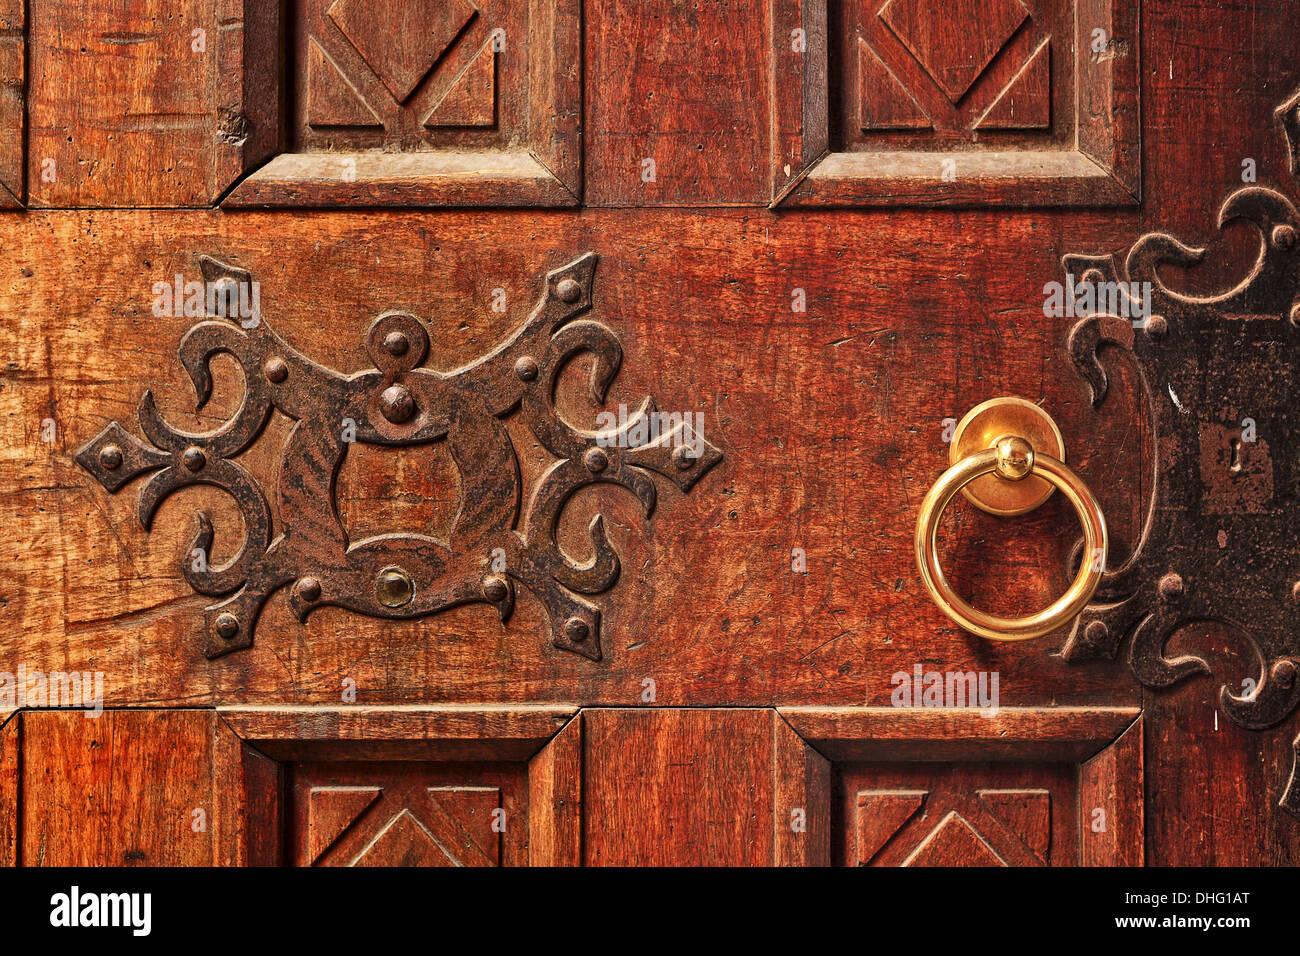 Closeup of old ornate wooden door with a gold door handle in Alba, Italy. - Stock Image